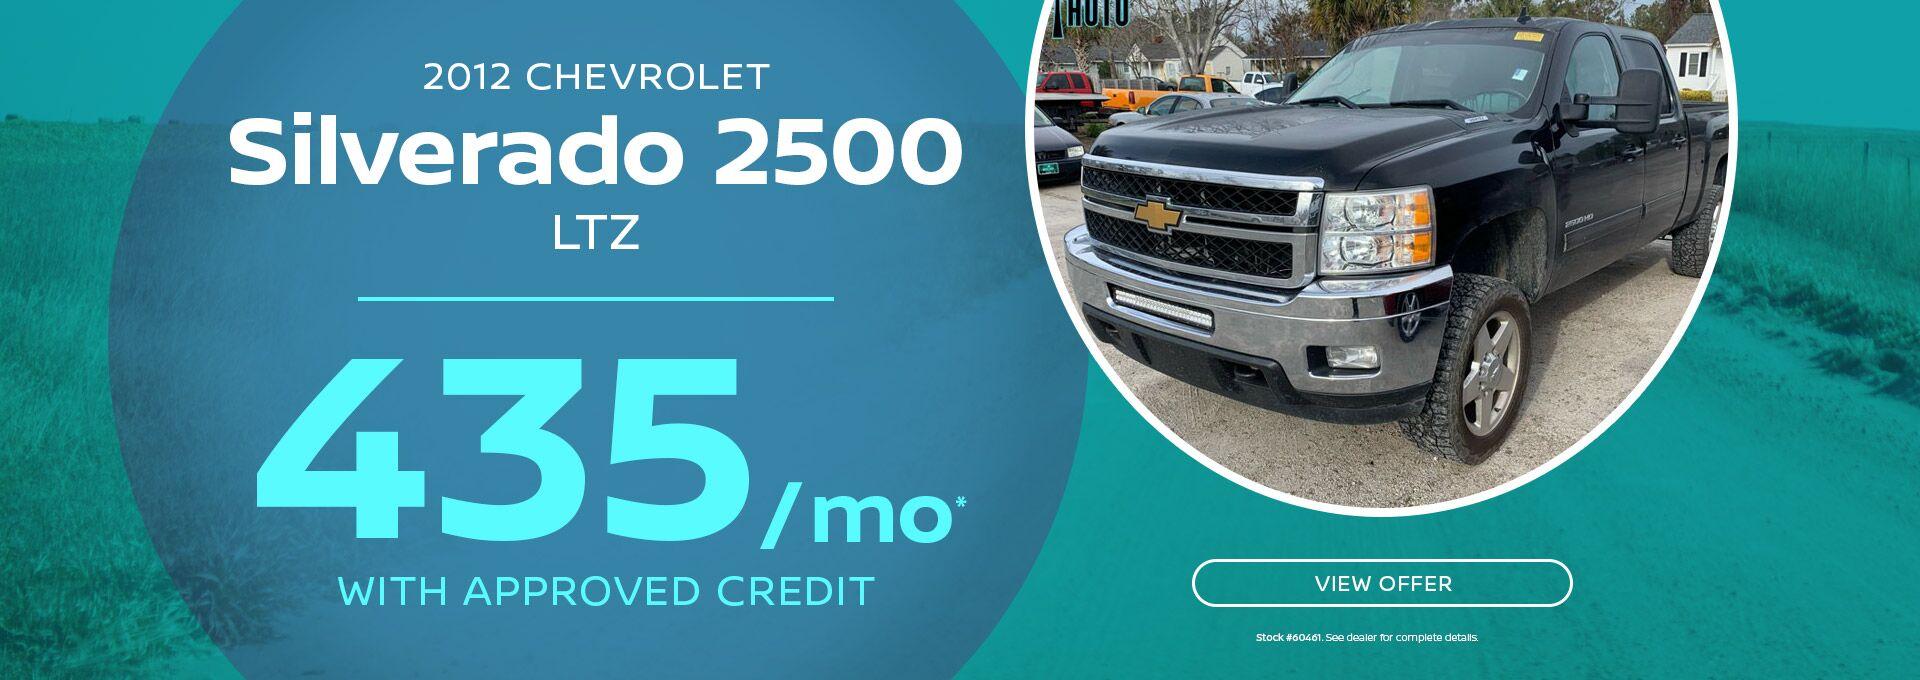 Used Car Dealerships In Jacksonville Nc >> Used Vehicle Dealership Newport Nc Bogue Auto Sales